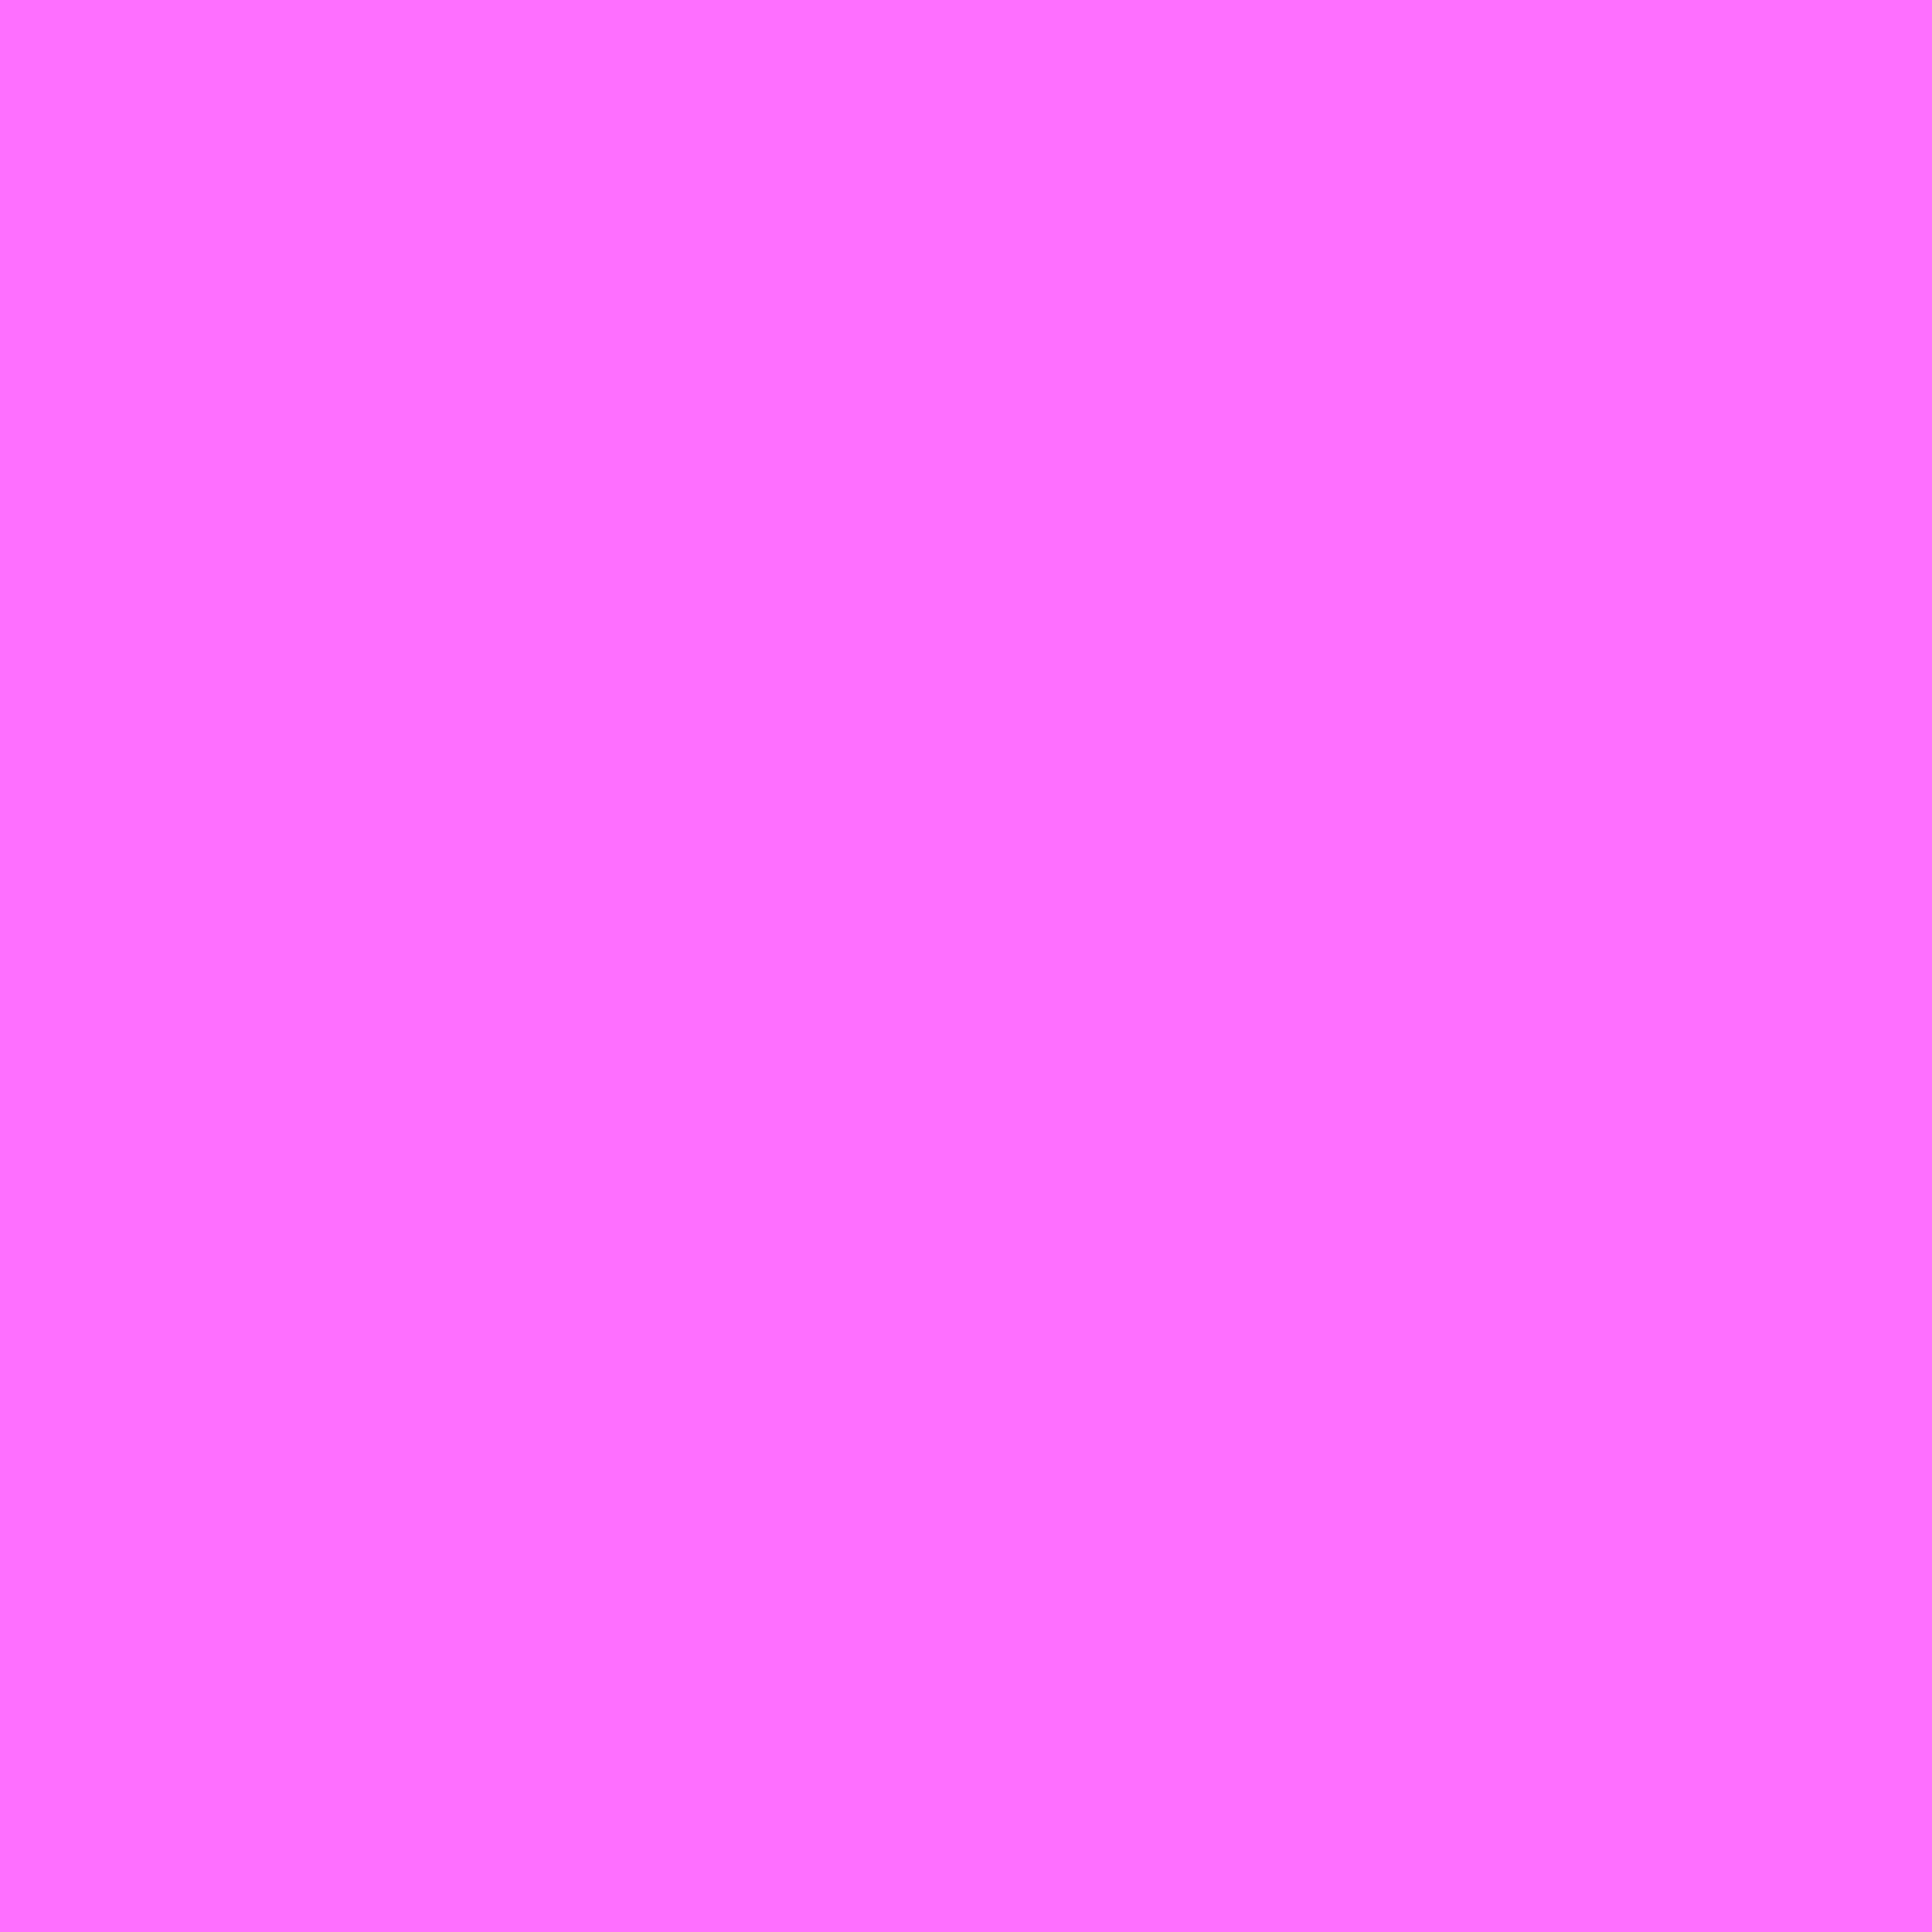 2732x2732 Shocking Pink Crayola Solid Color Background